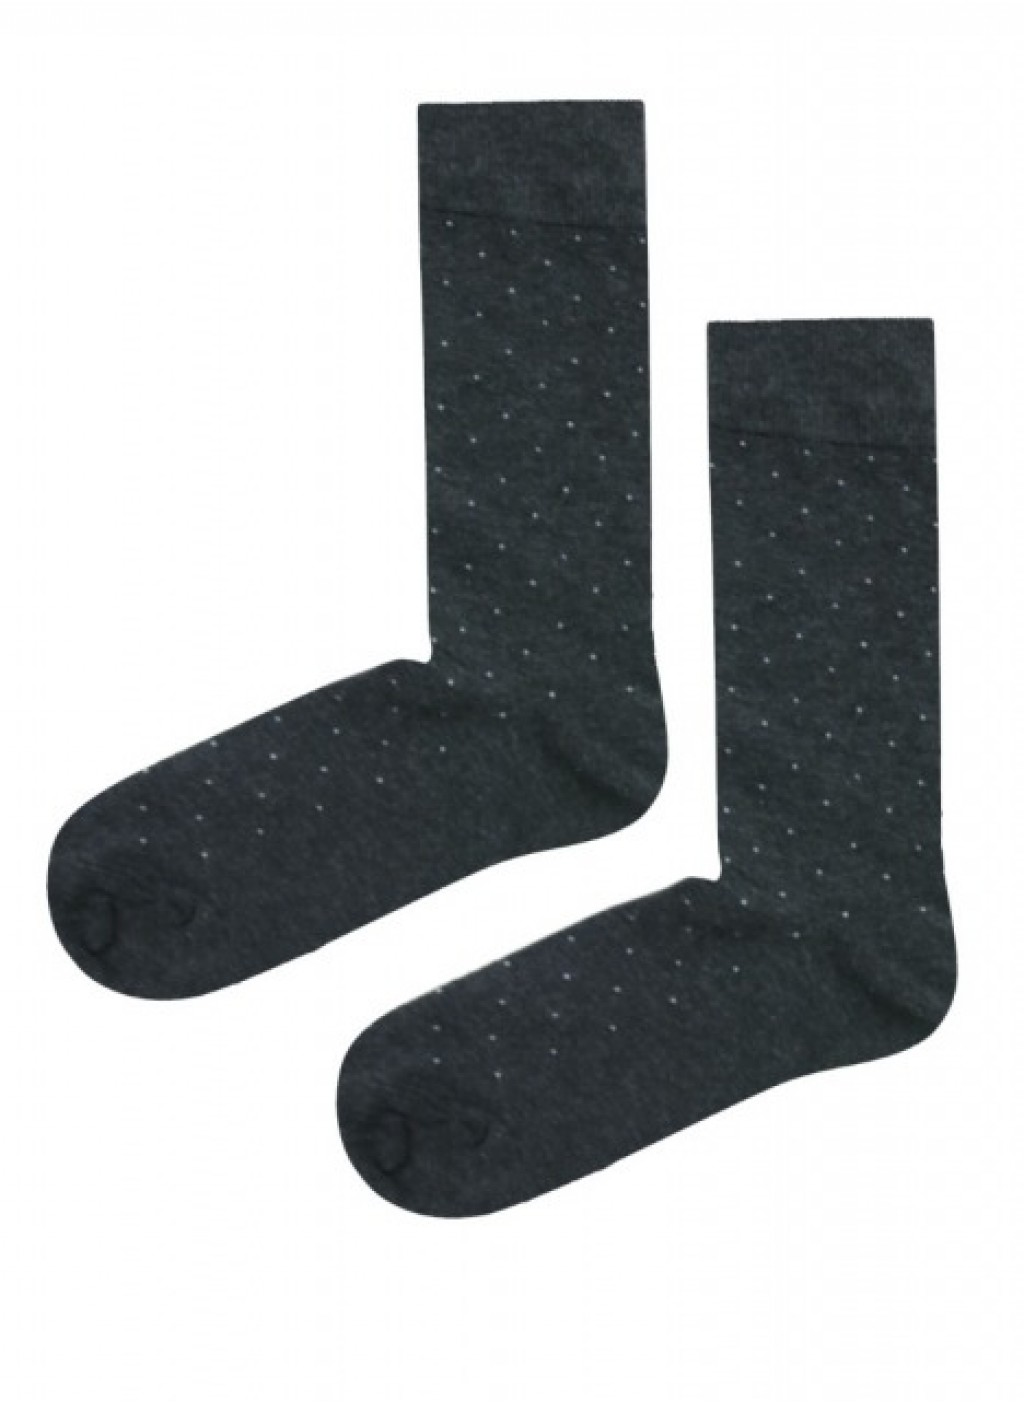 Шкарпетки Speckled Black